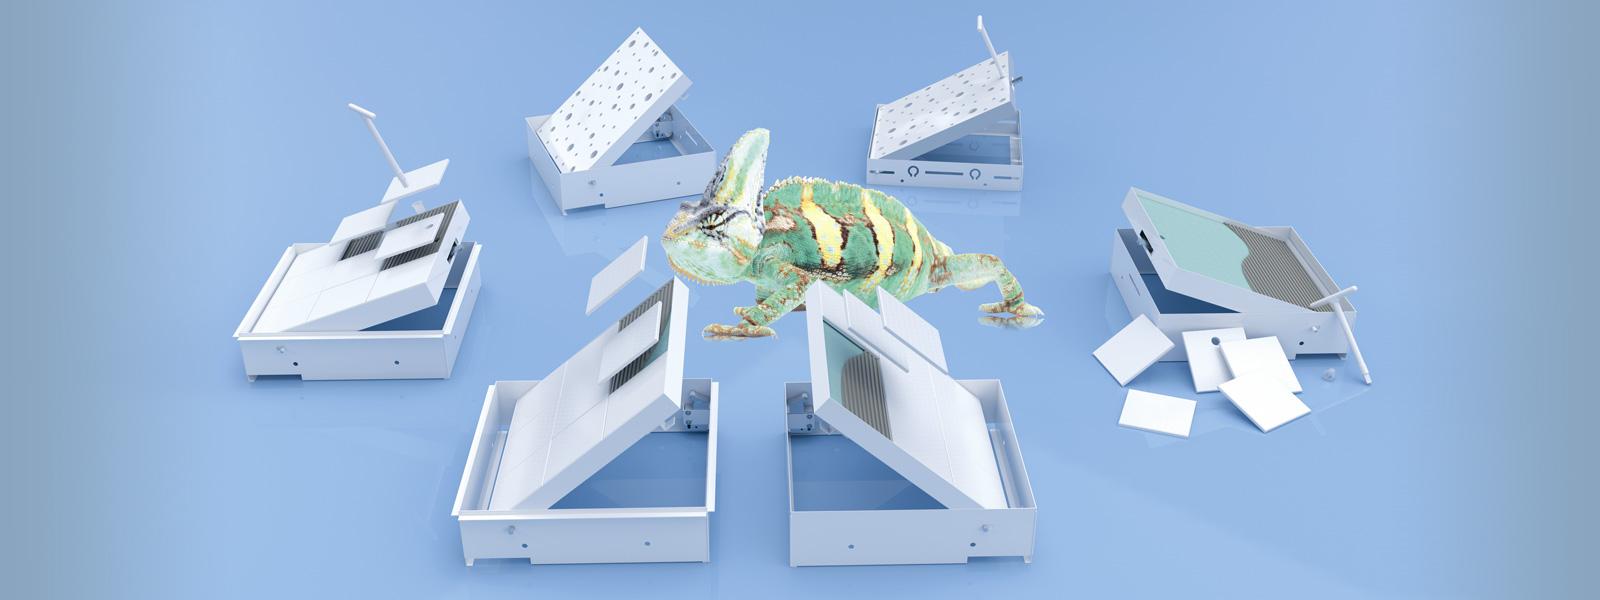 Chameleon Access Panels